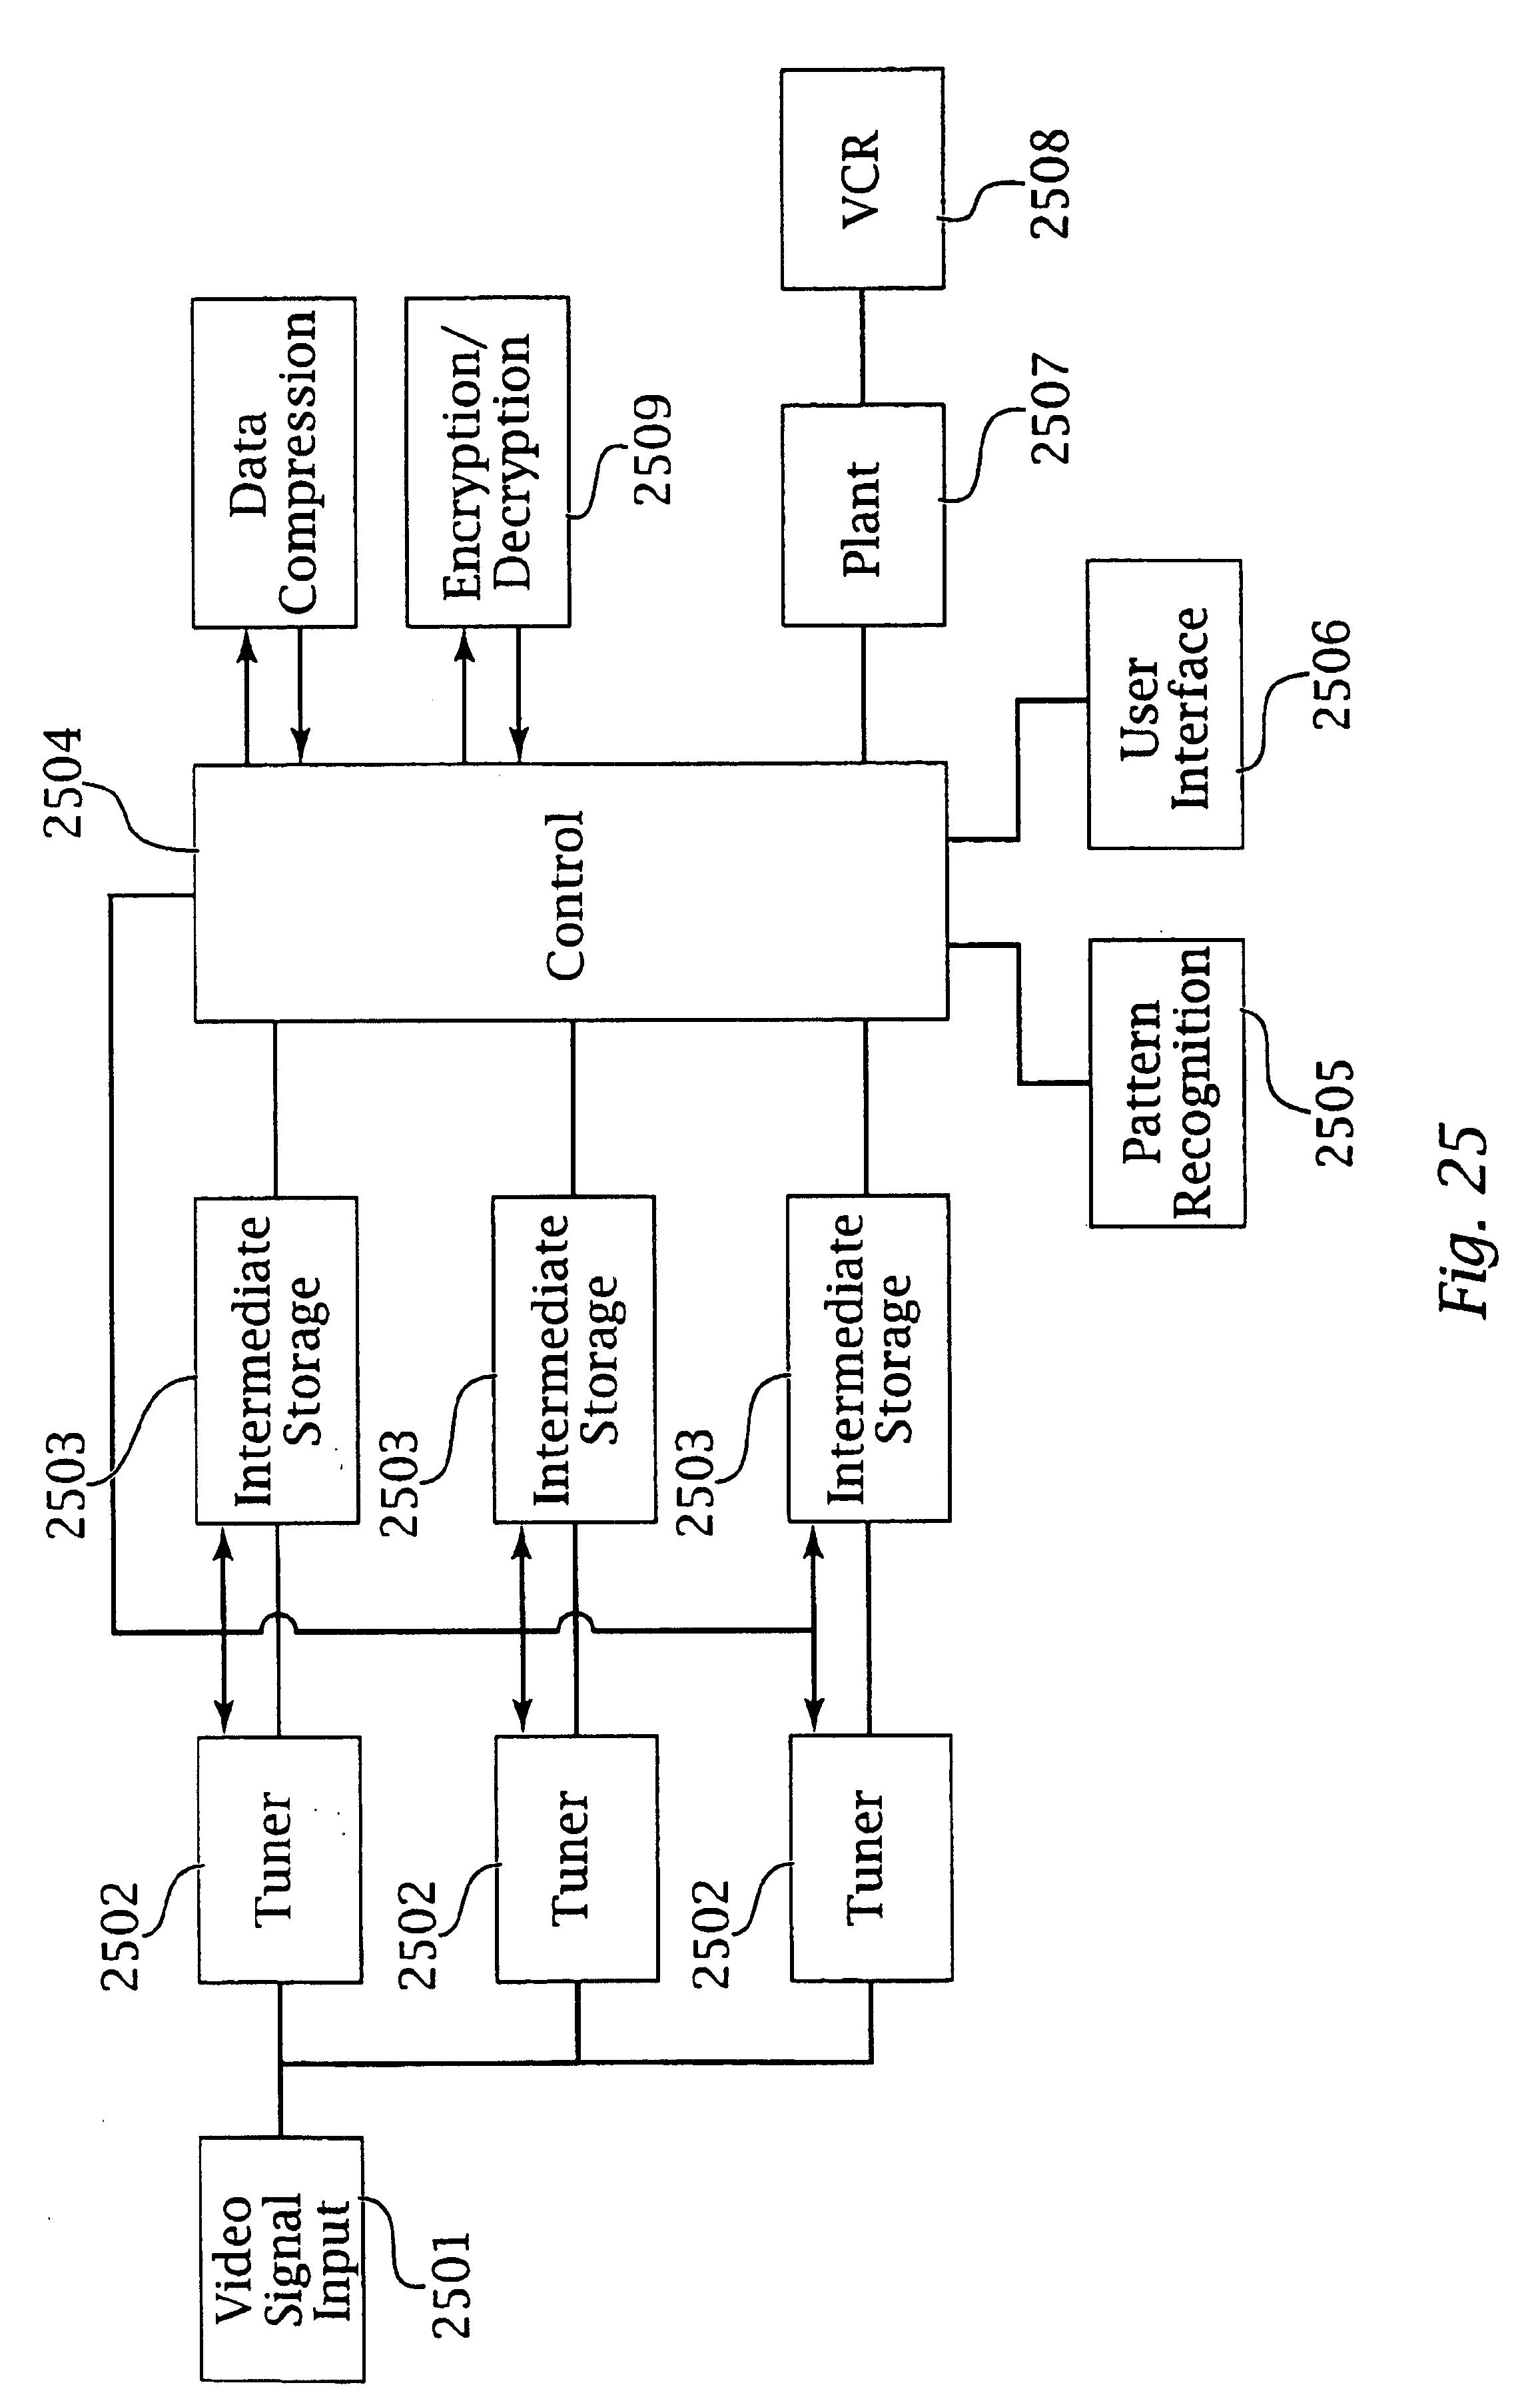 Patent Us 6850252 B1 Best Combination Lock Pic16f84 Circuit Diagram Super 0 Petitions